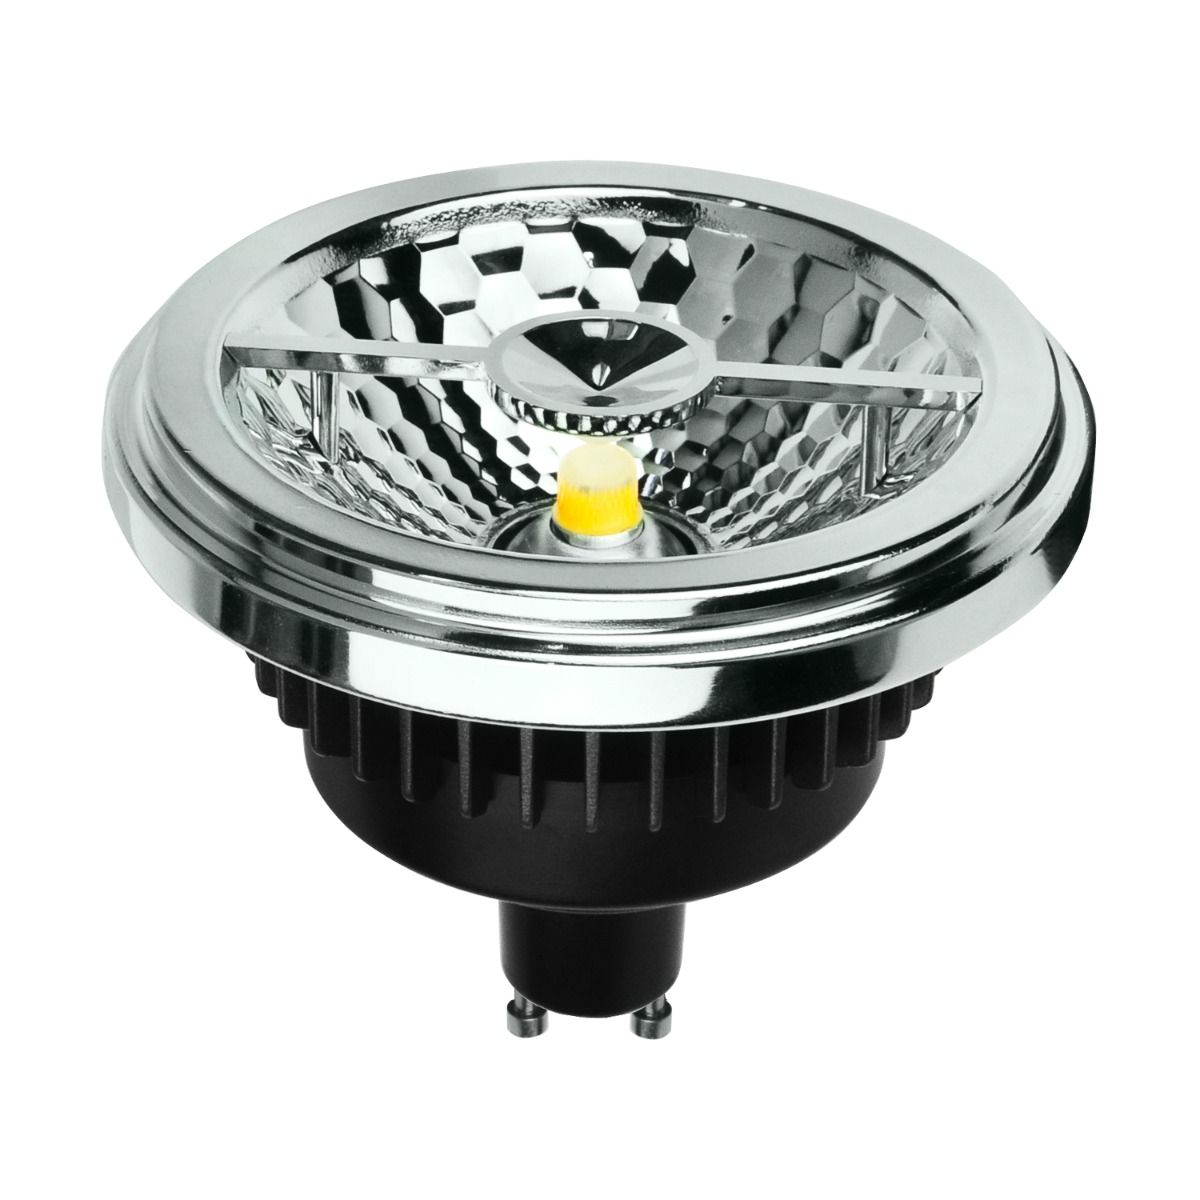 Noxion LEDspot AR111 GU10 Pro V2.0 15-75W 927 40D 780lm DIM